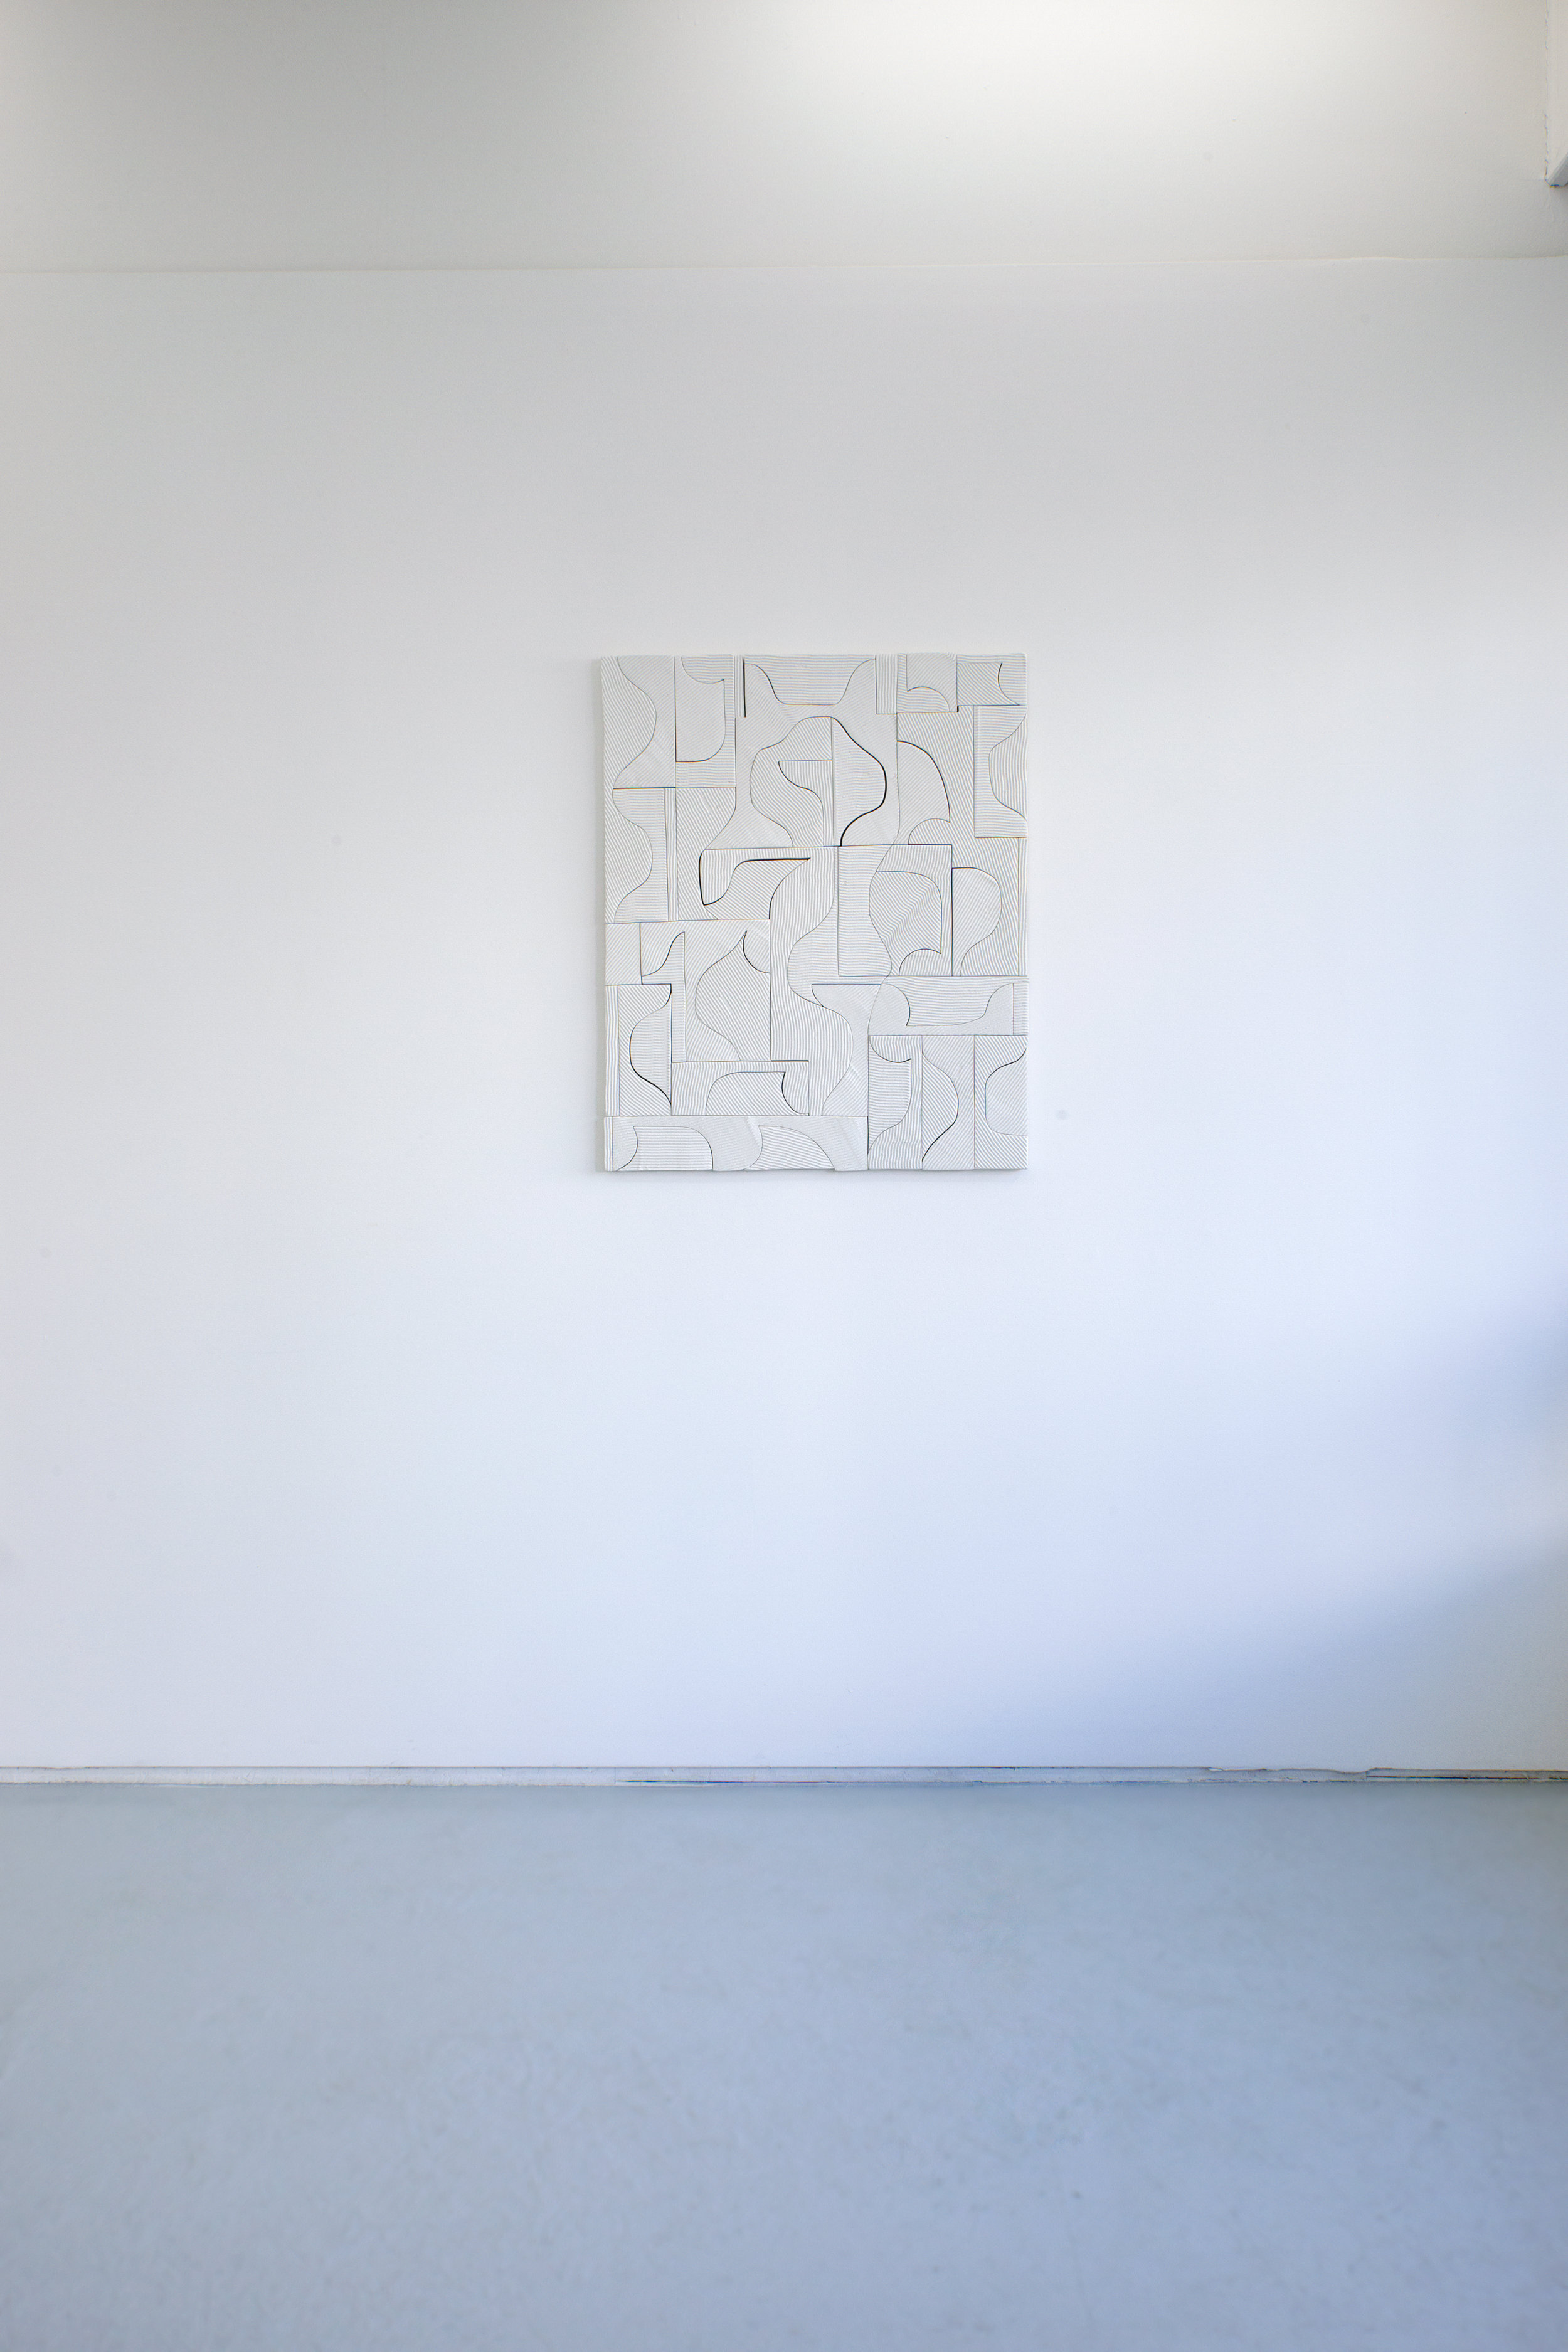 Elizabeth_Atterbury-Night_Comes_In-Installation_View_011.jpg